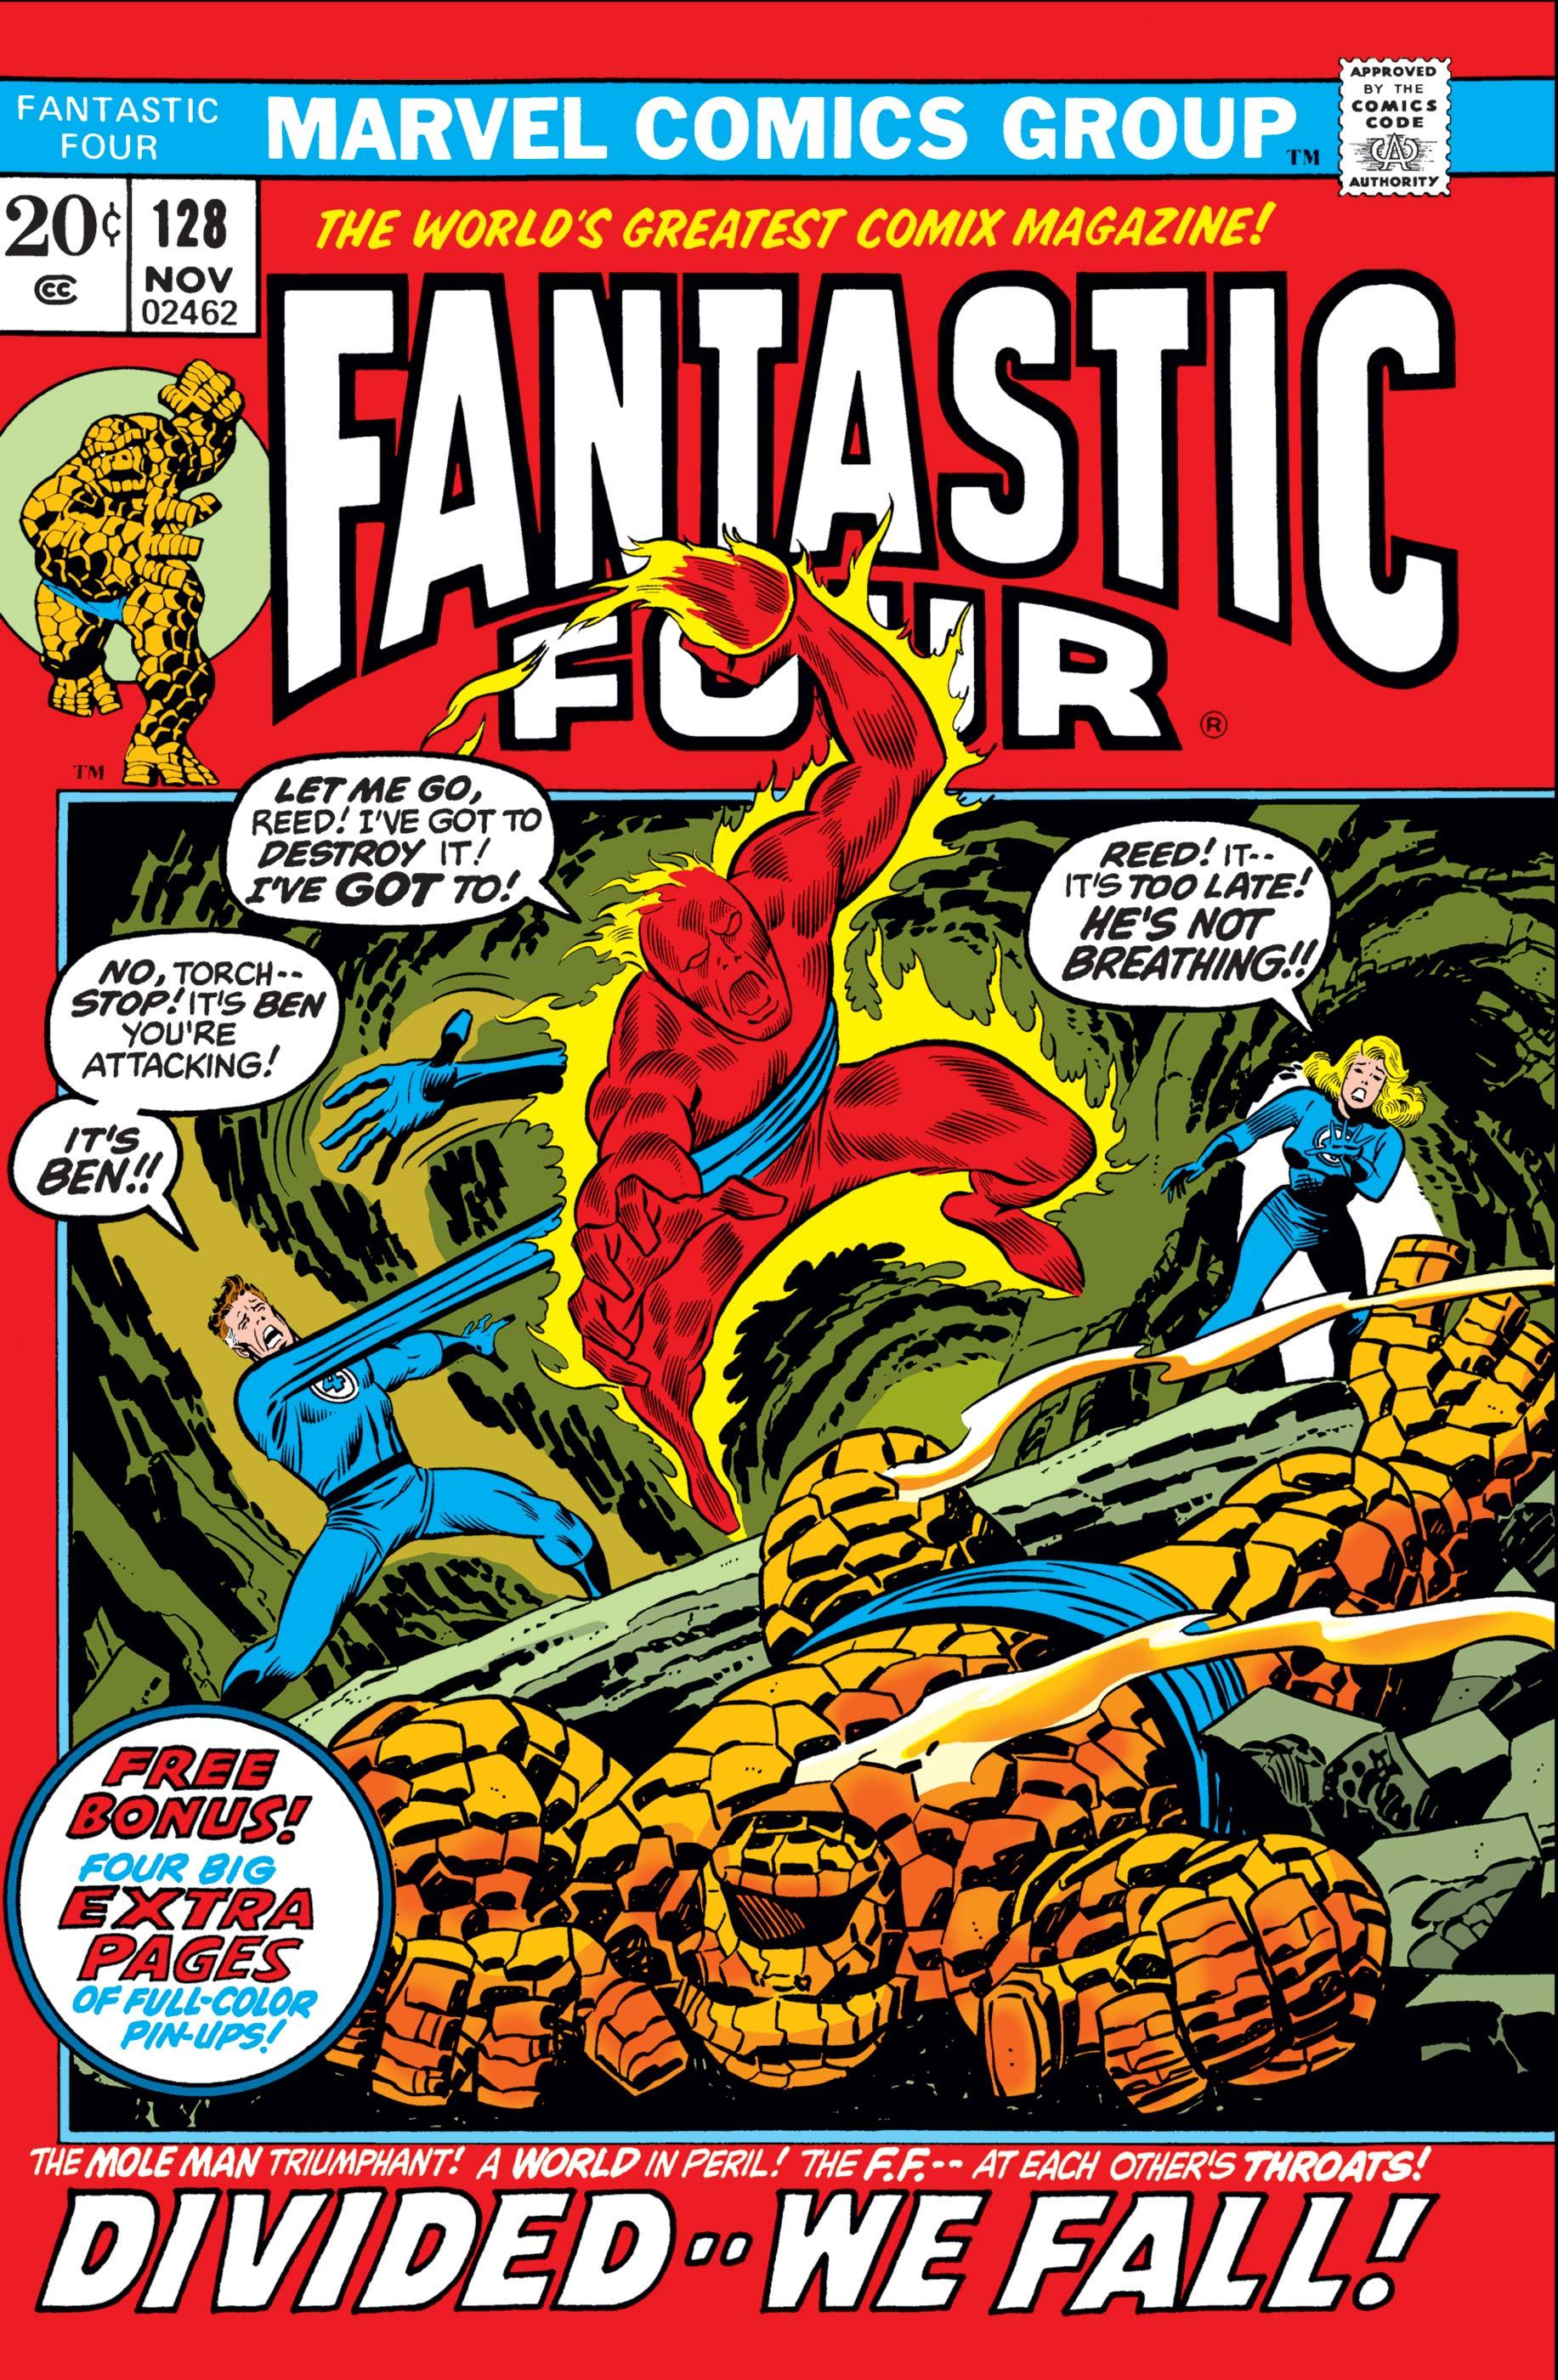 Fantastic Four (1961) #128